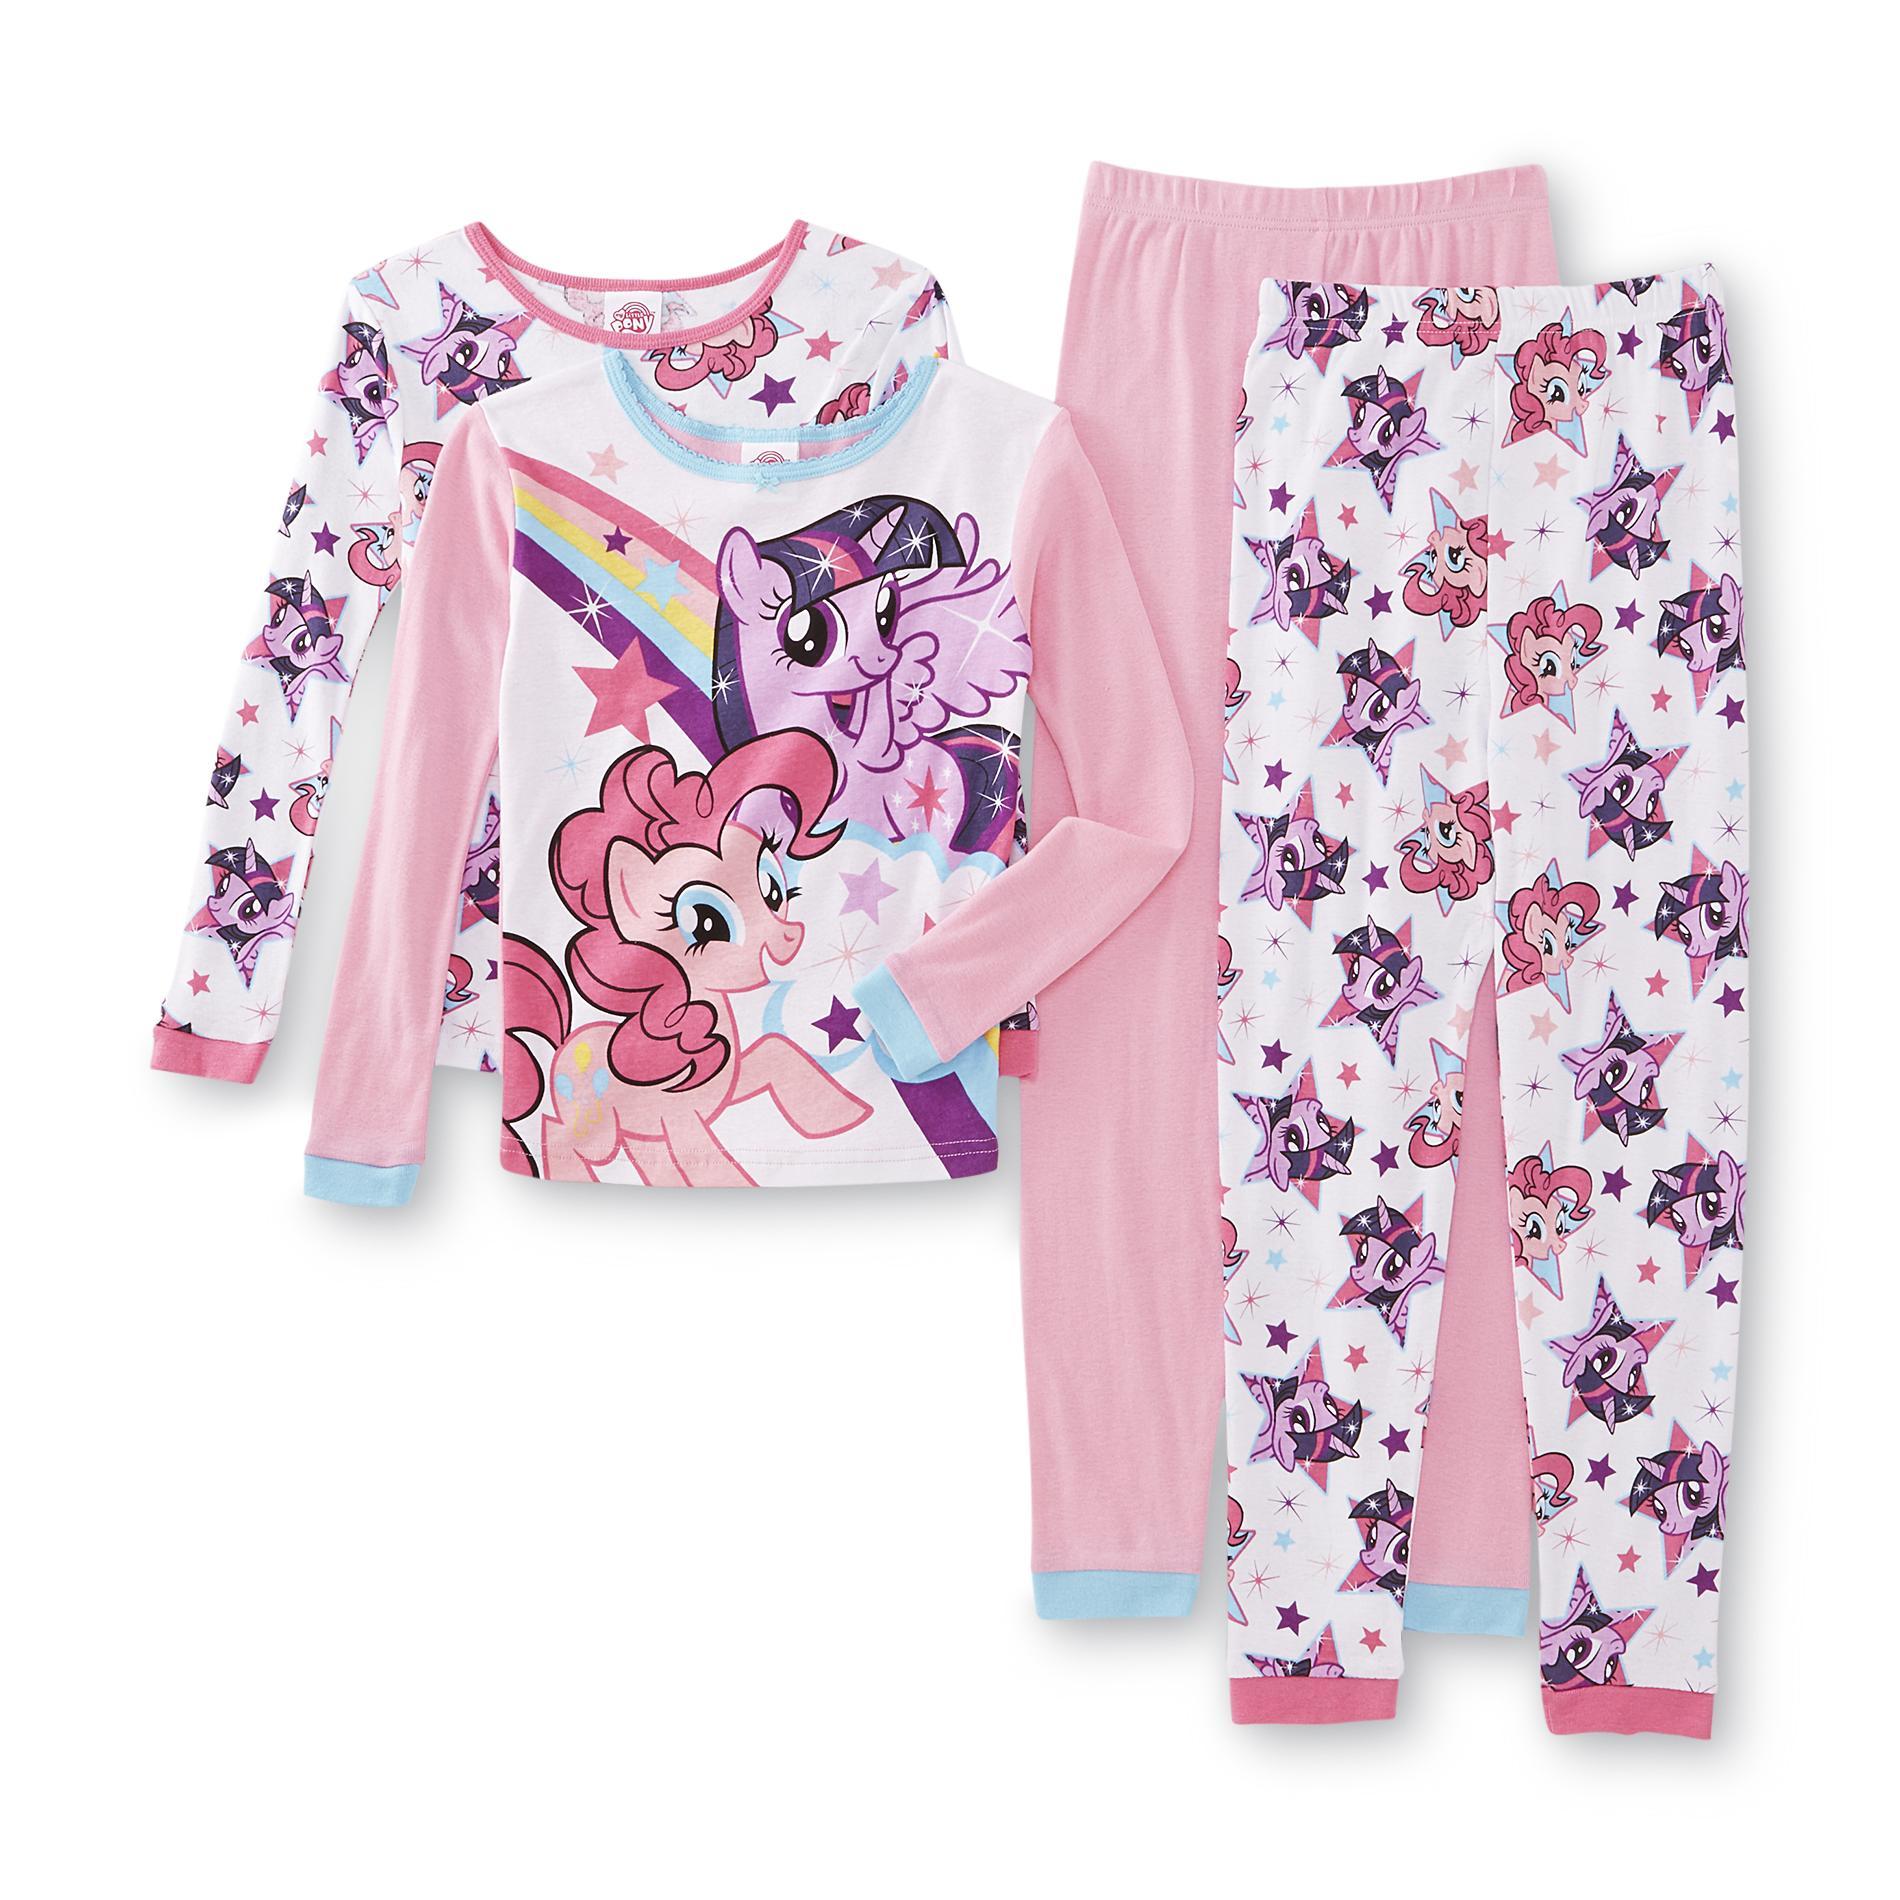 My Little Pony Girl's 2-Pairs Pajama Shirts & Pants